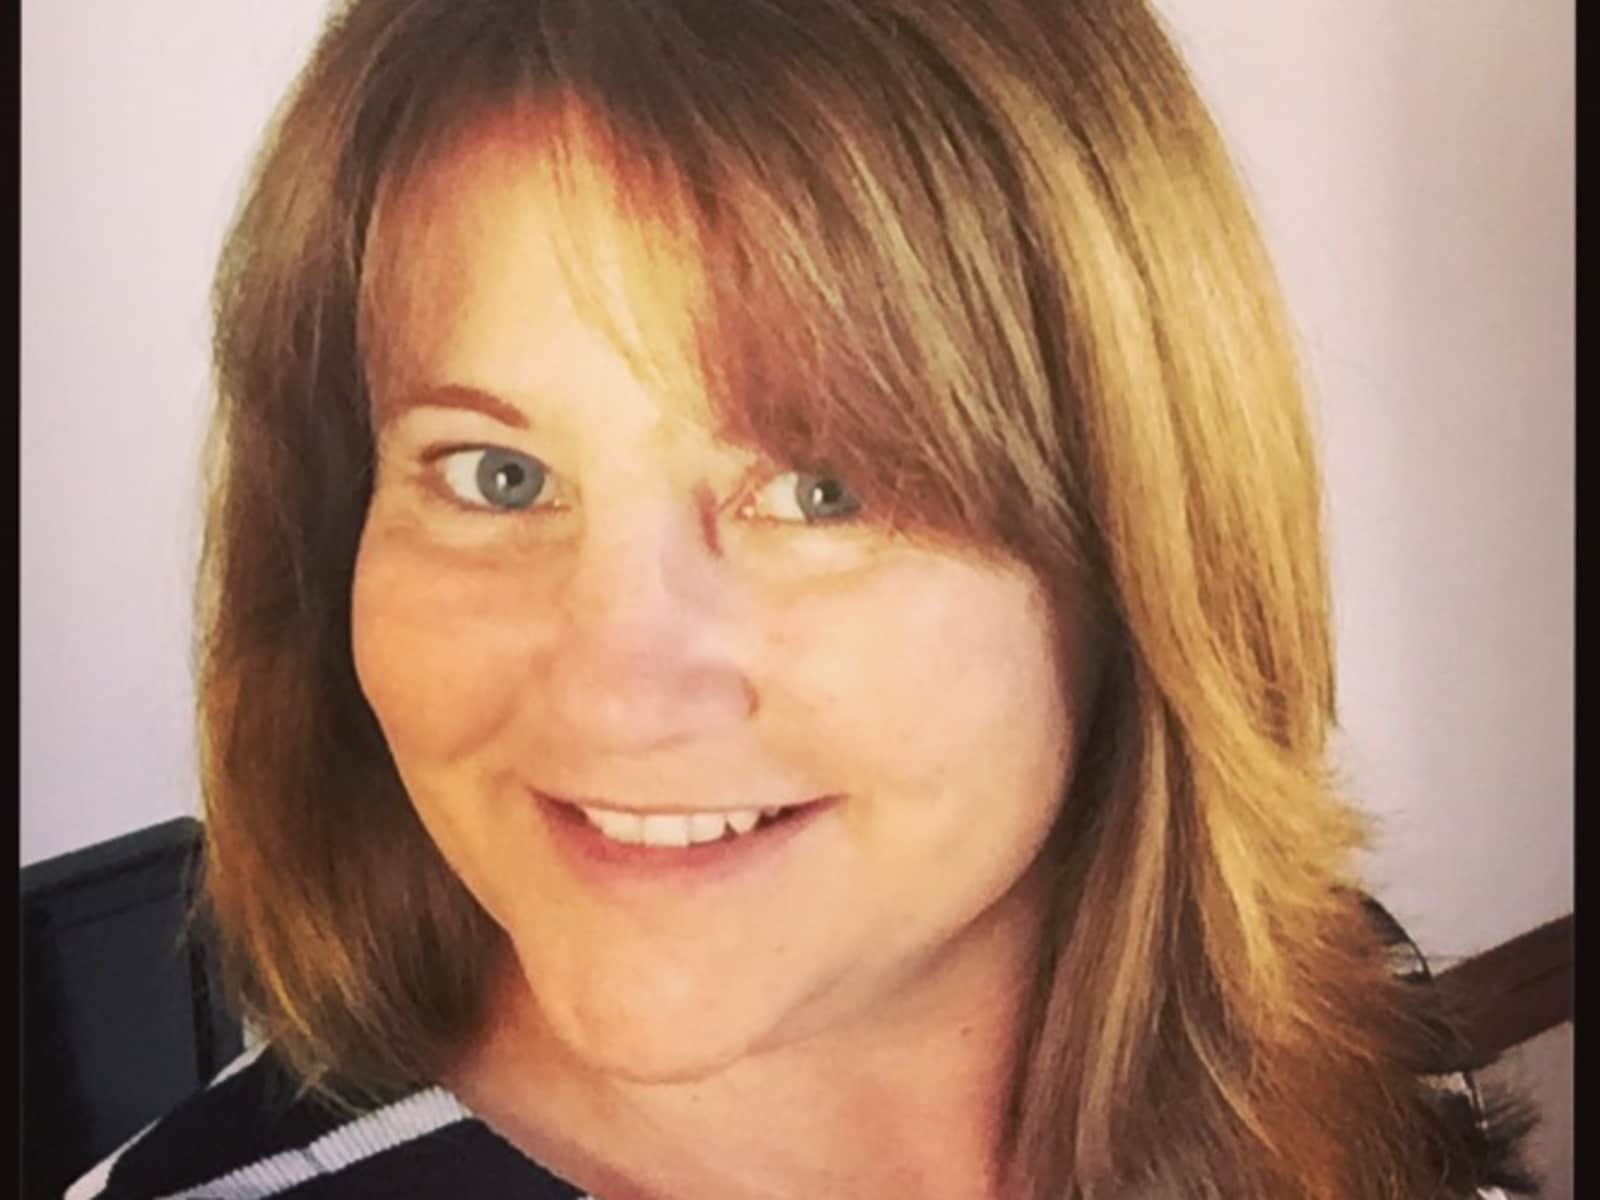 Brenda from Hervey Bay, Queensland, Australia